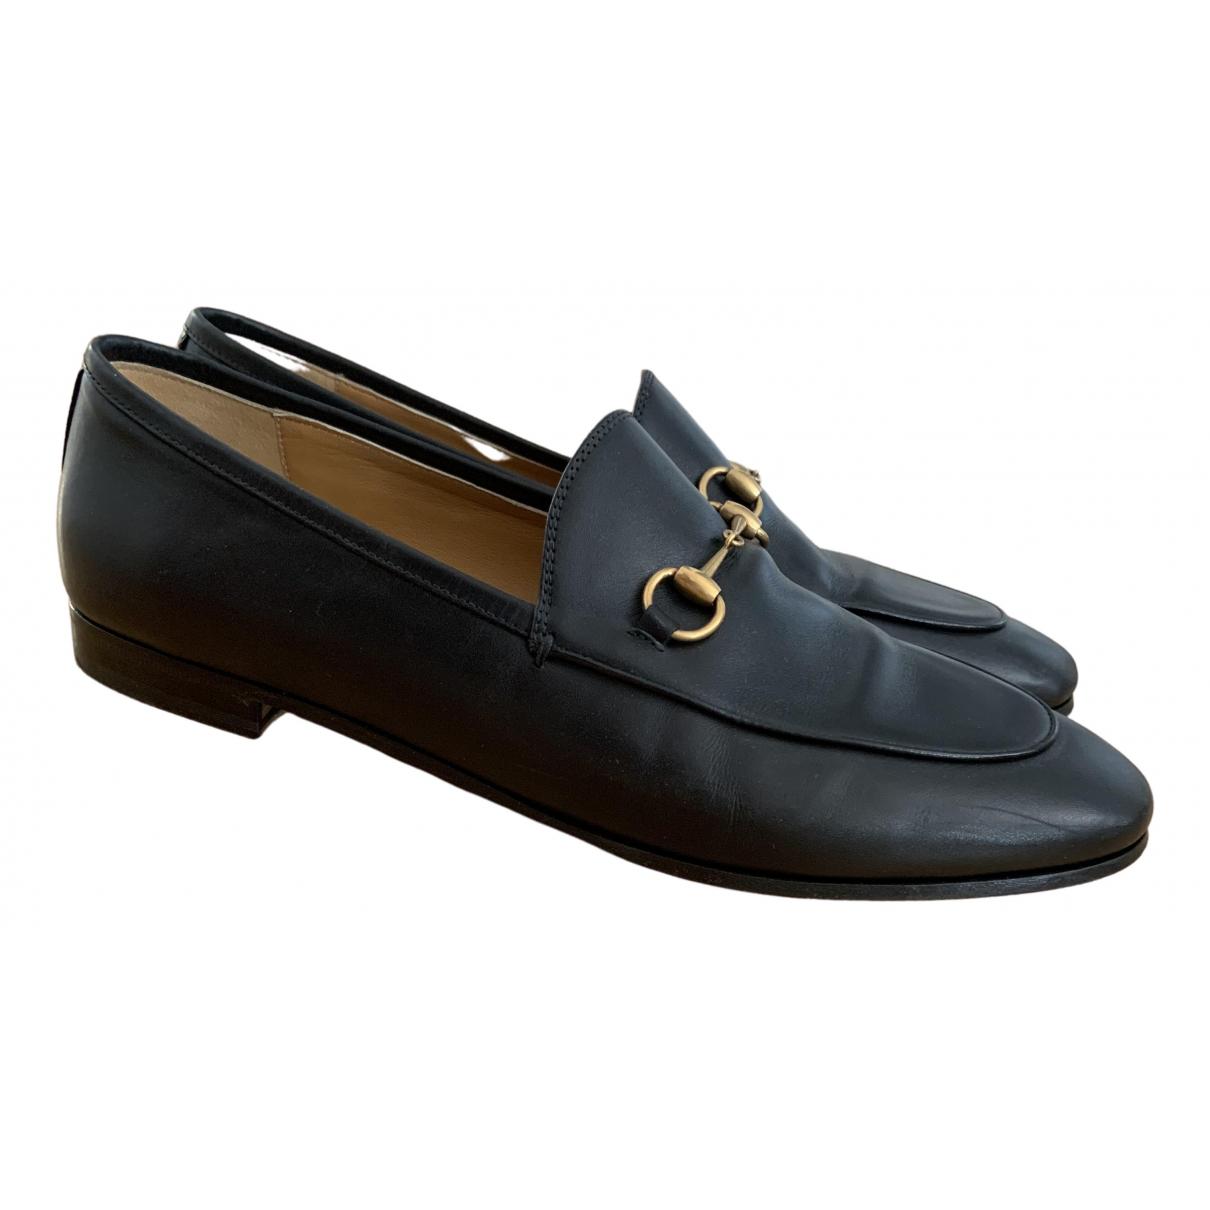 Gucci Jordaan Black Leather Flats for Women 41 IT